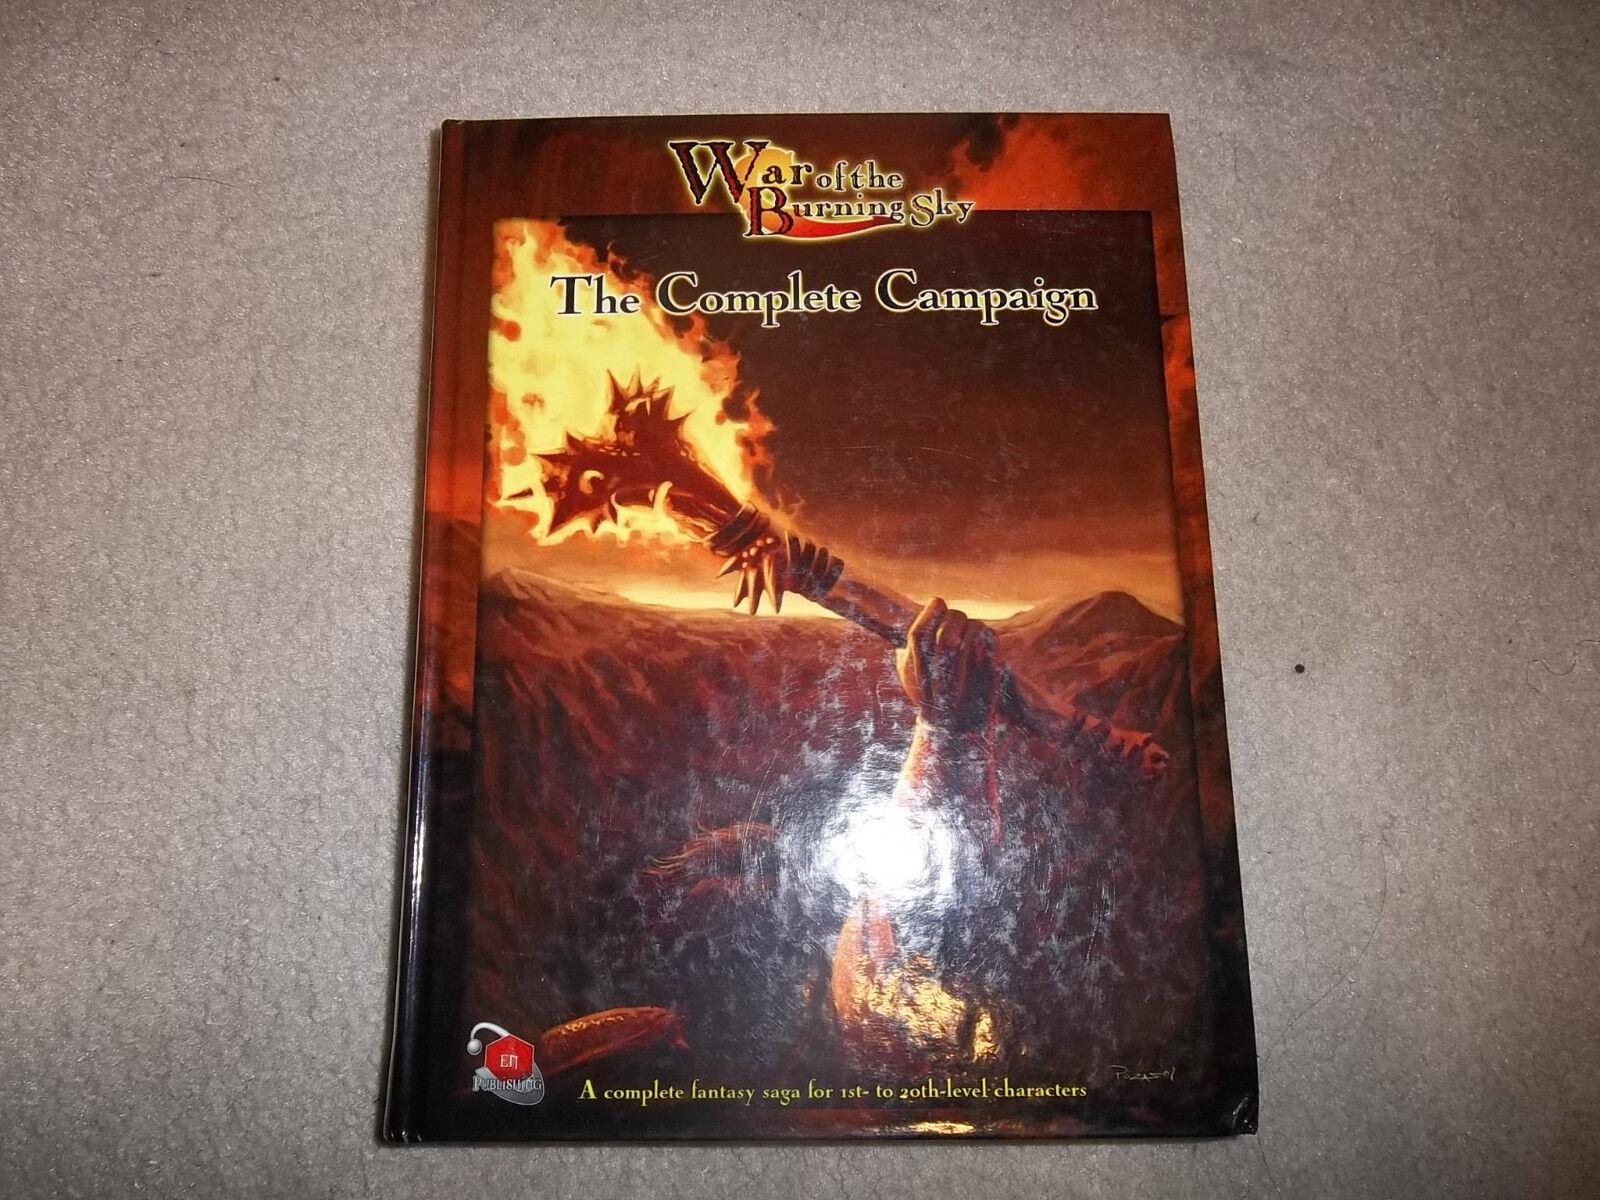 D &D D20 En Publishing War of the Burning Sky The Hel Campaign Hardcover